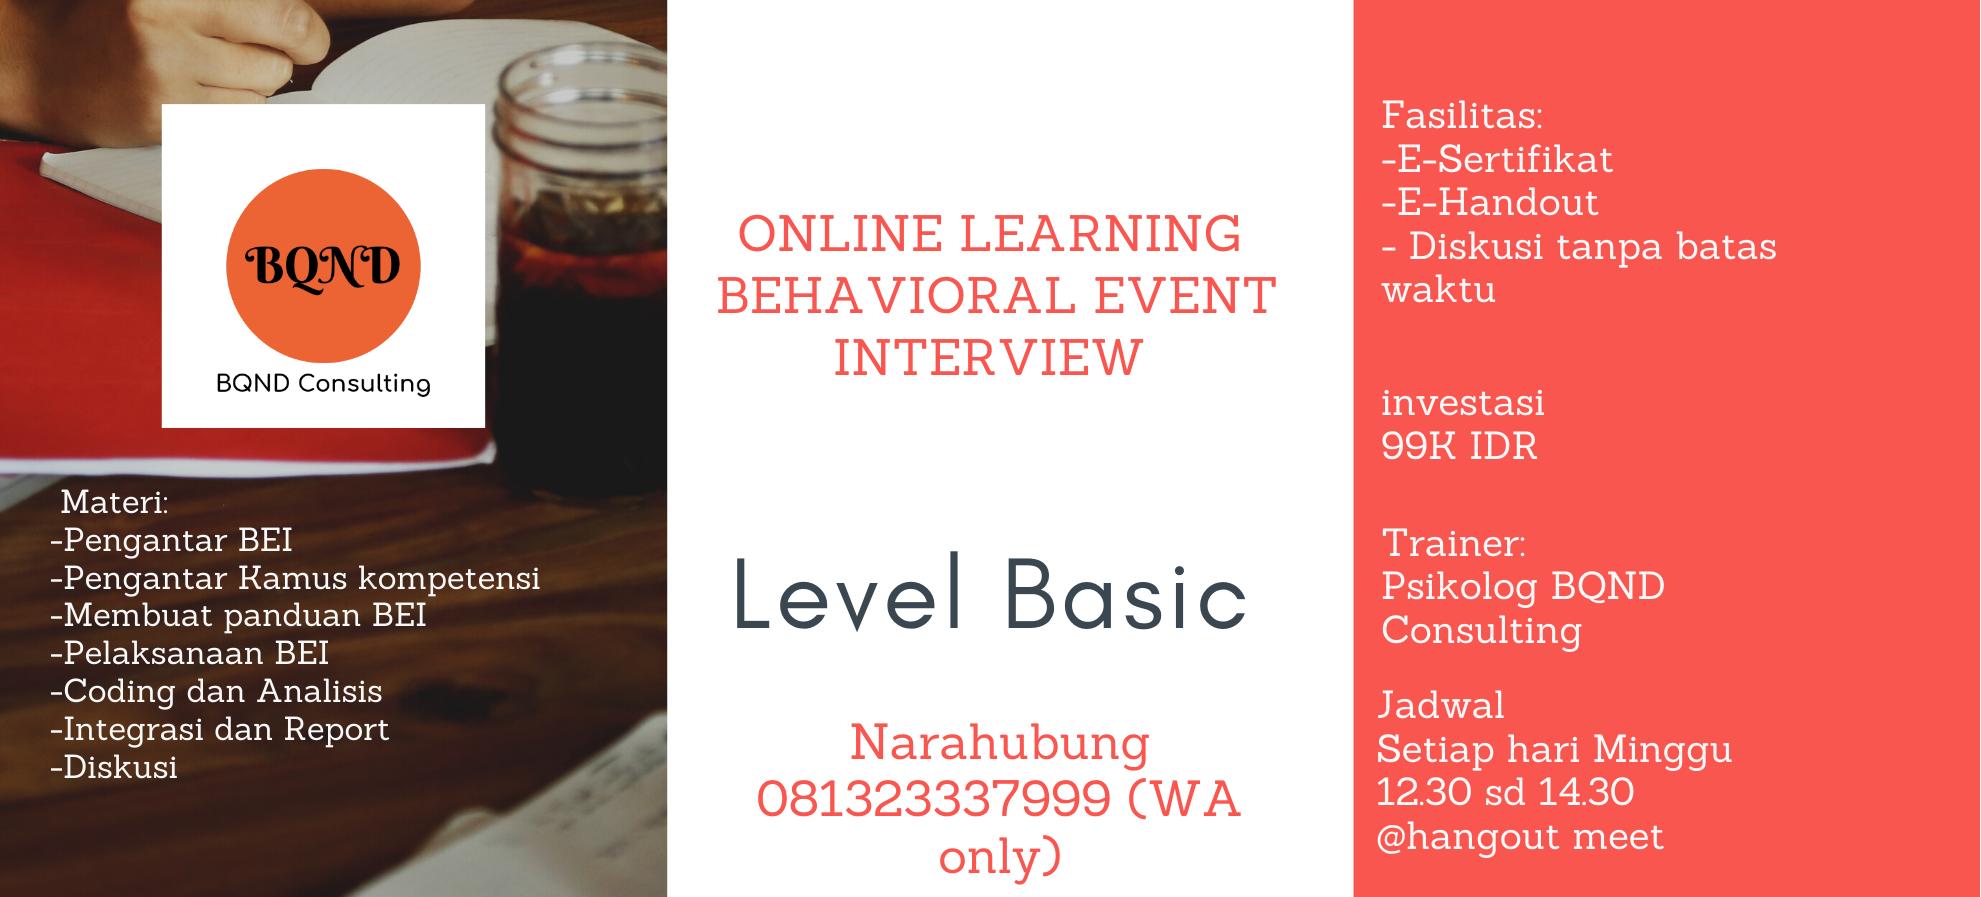 Online Training: Behavioral Event Interview level Basic